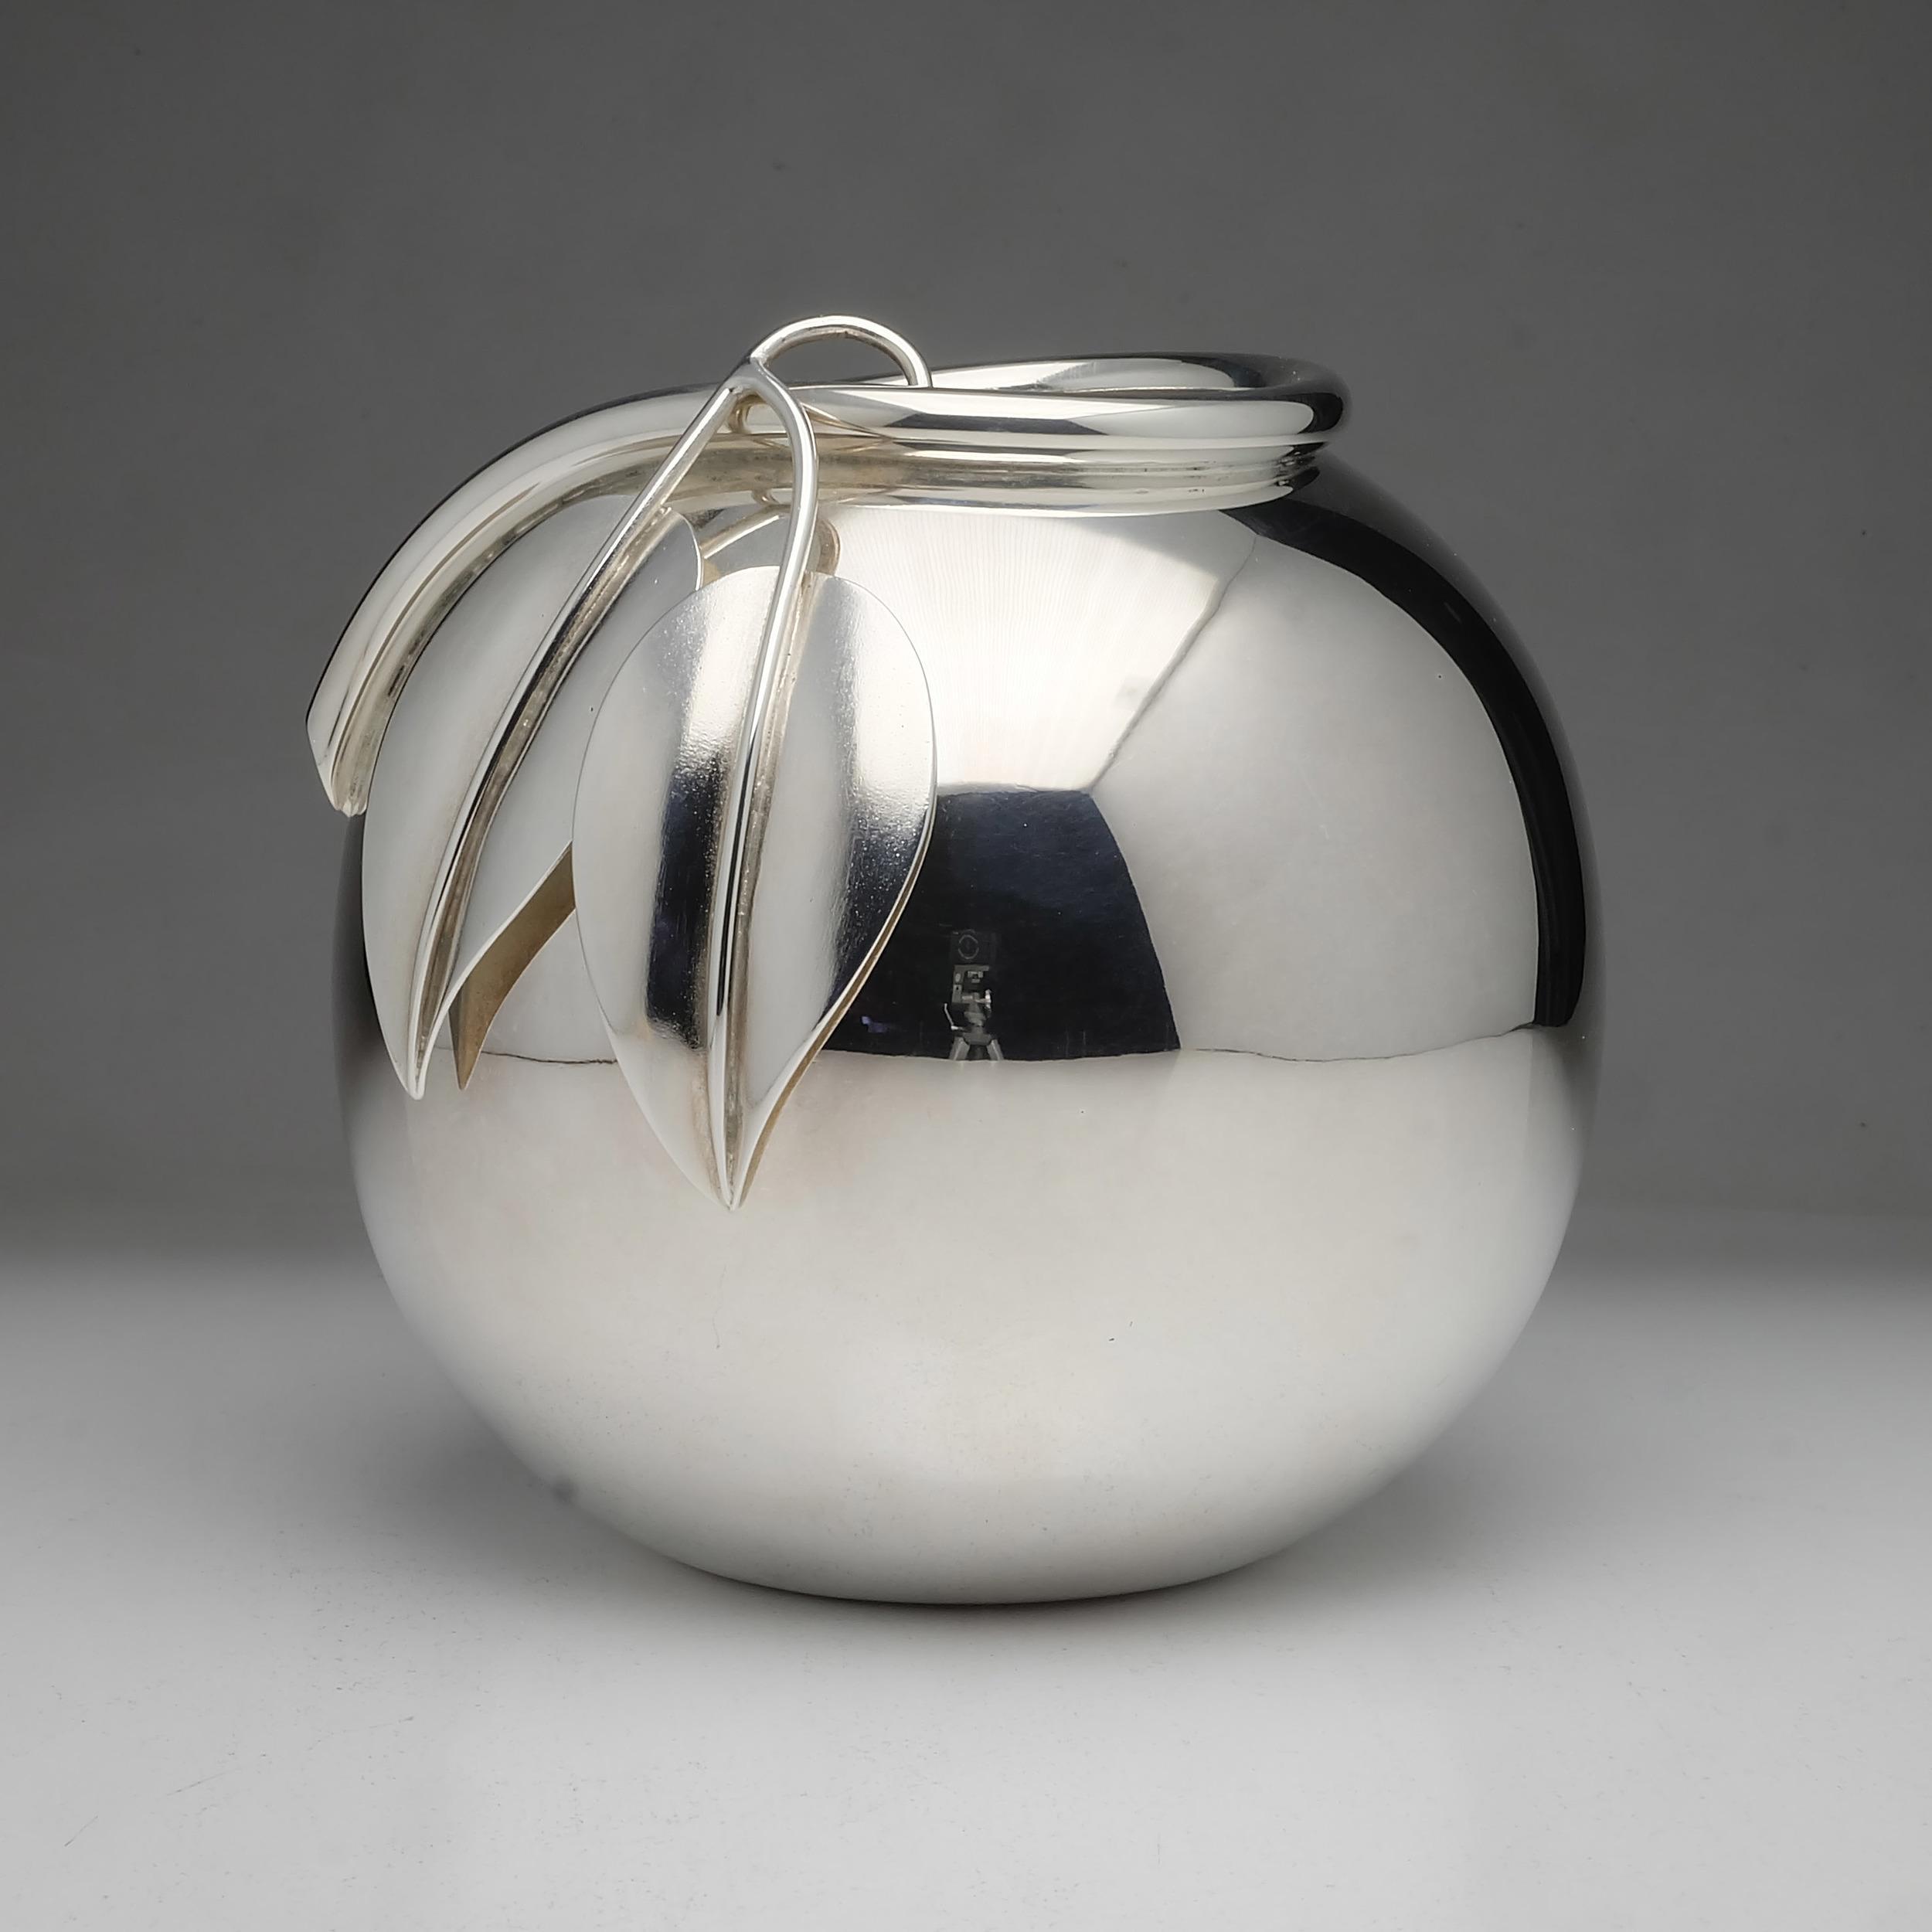 'European 800 Silver Modernist Vase 626g'